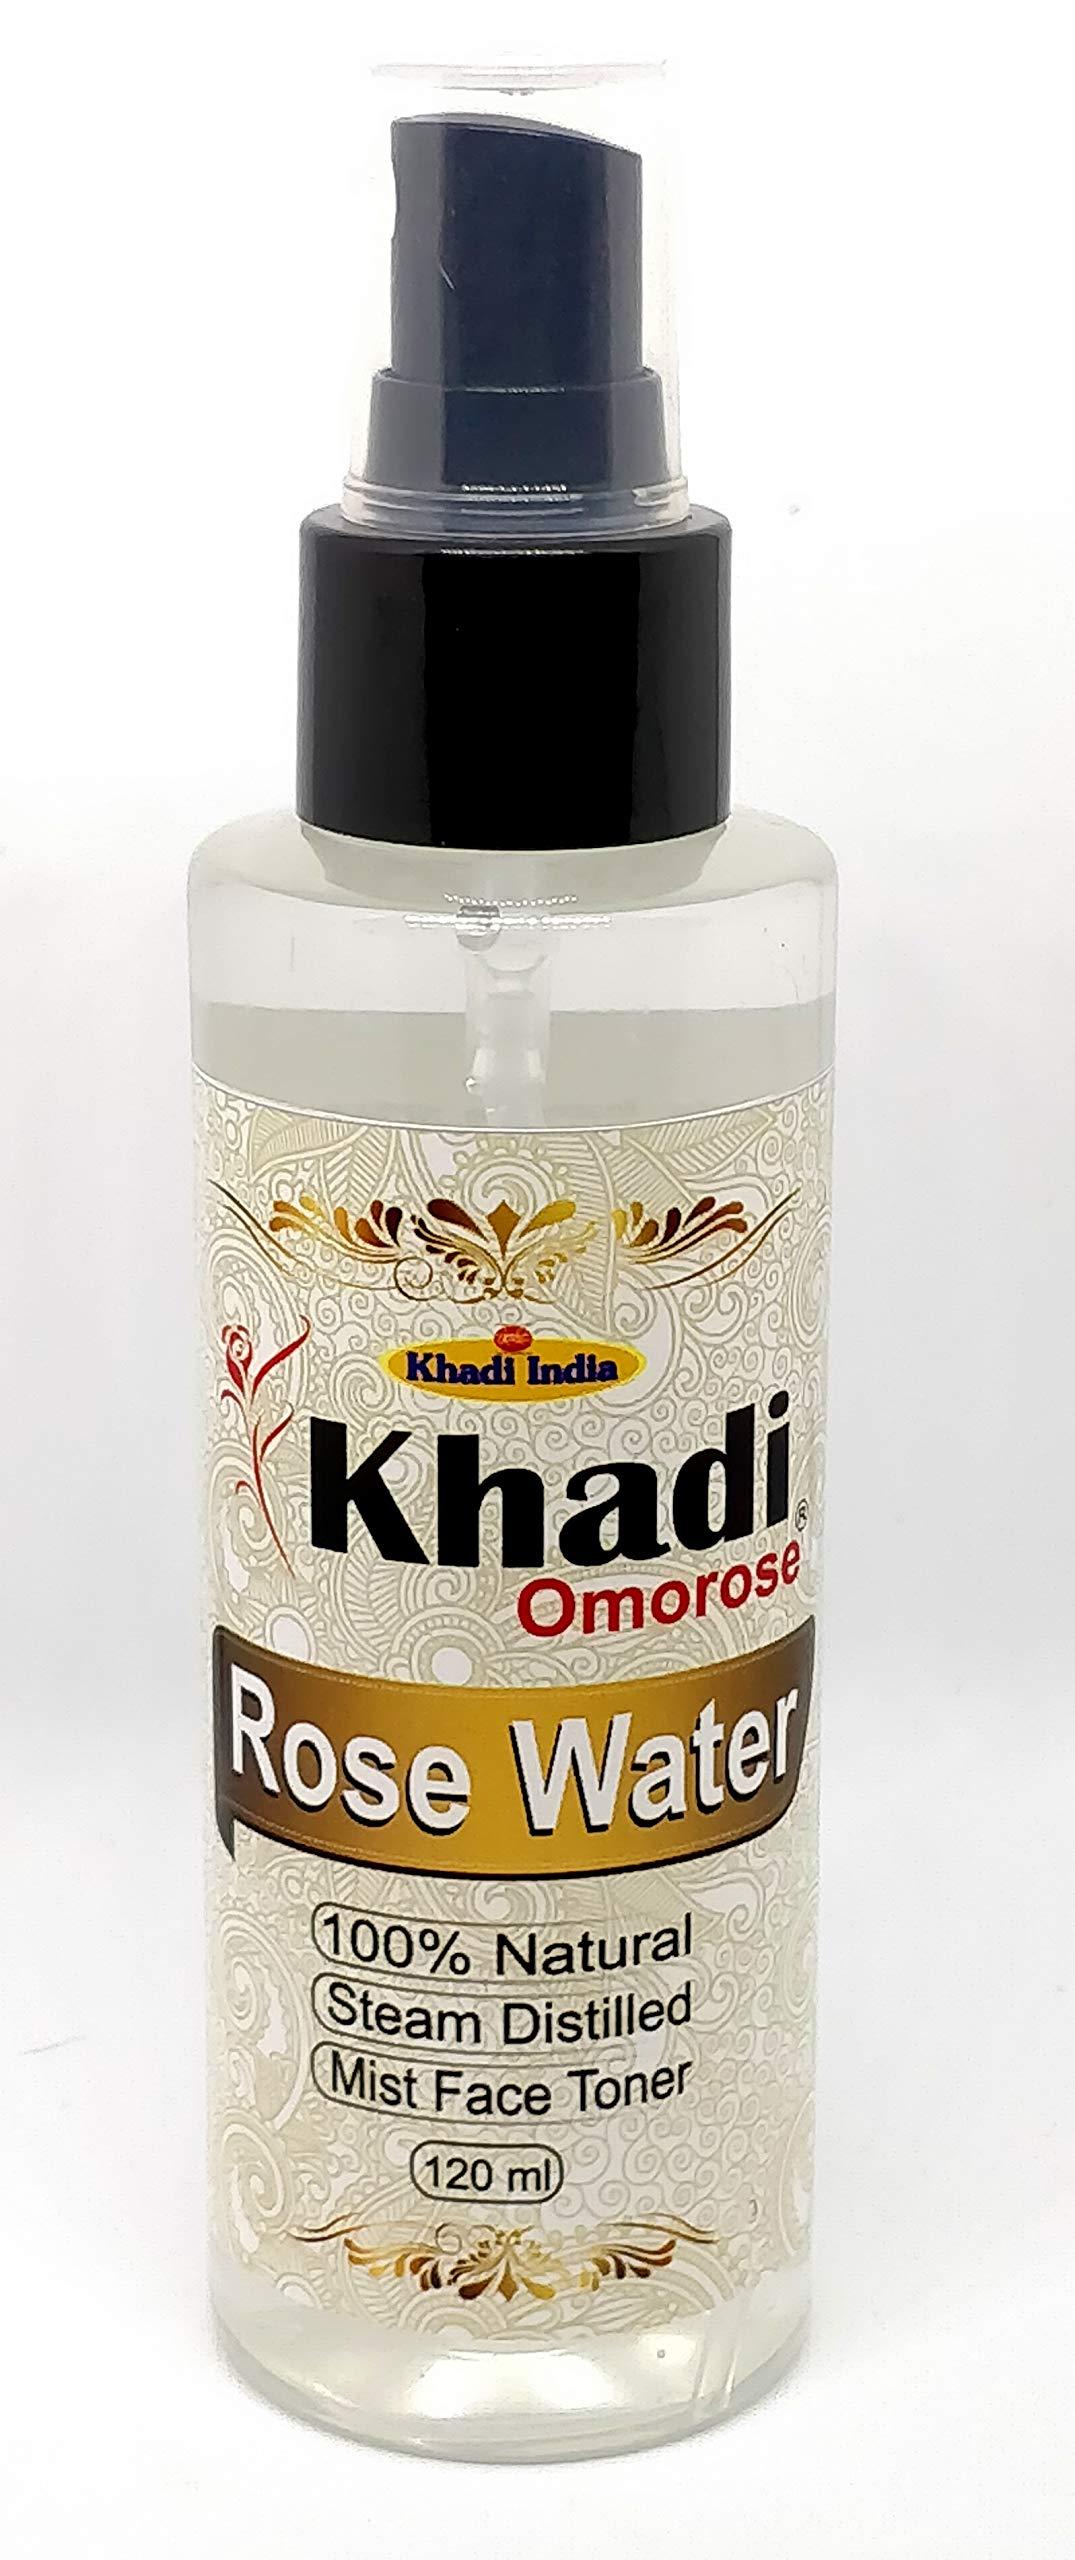 KHADI Omorose Rose Water Natural Derived From Steam Distillation Roses Petals product image